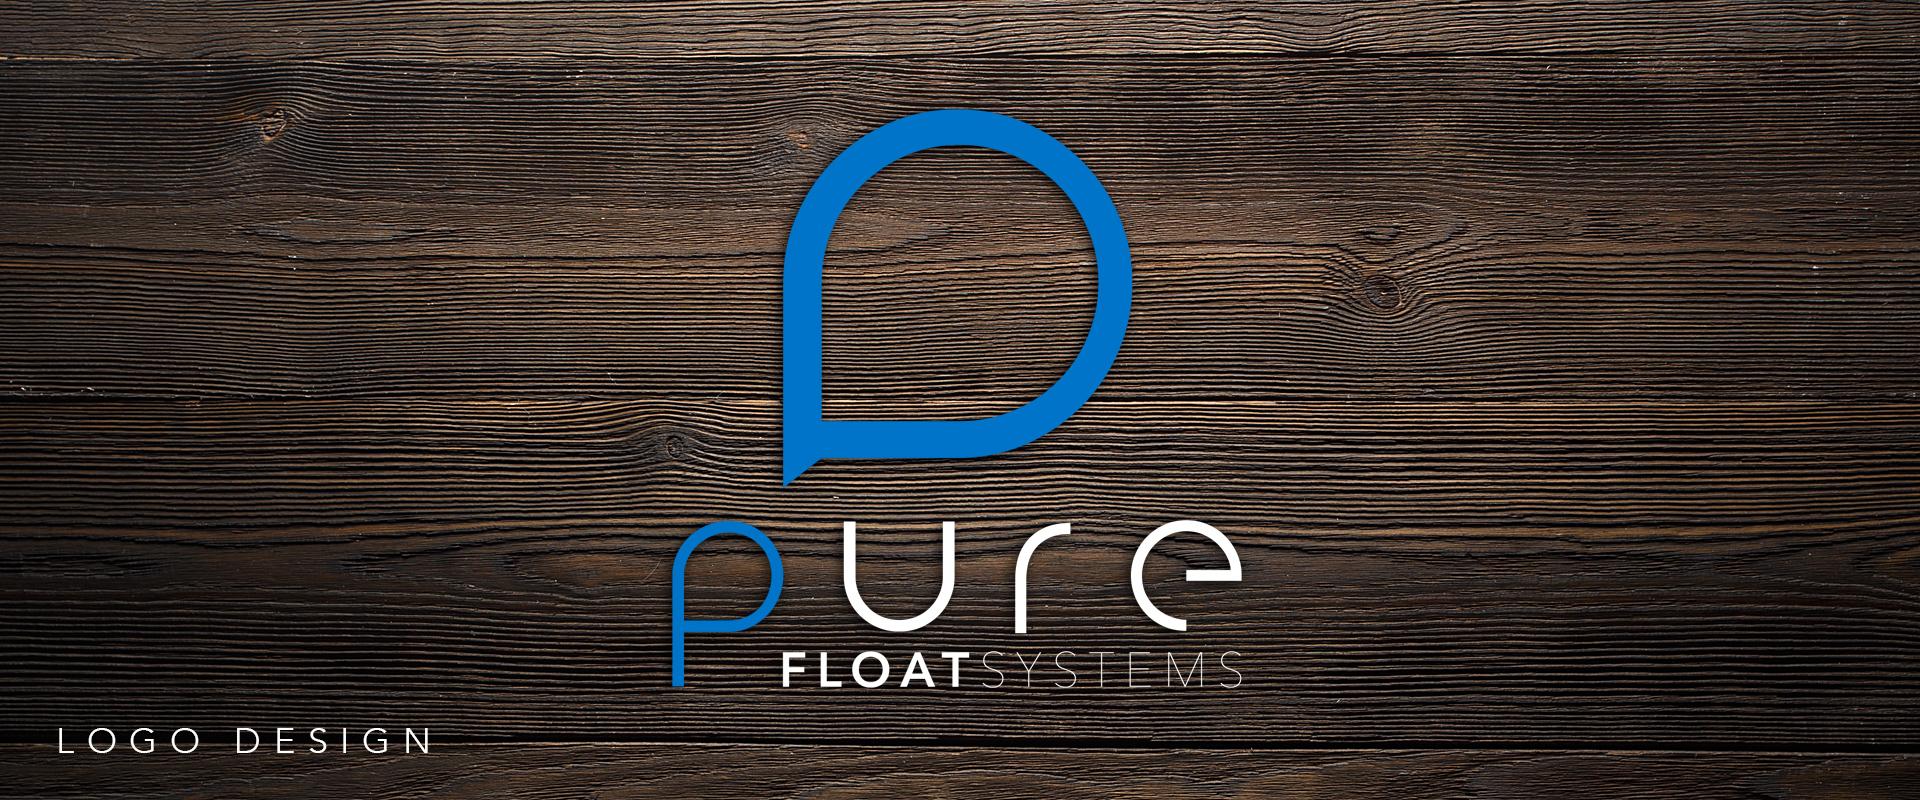 JoshMackey-LogoDesign-PureFloatSystems.jpg